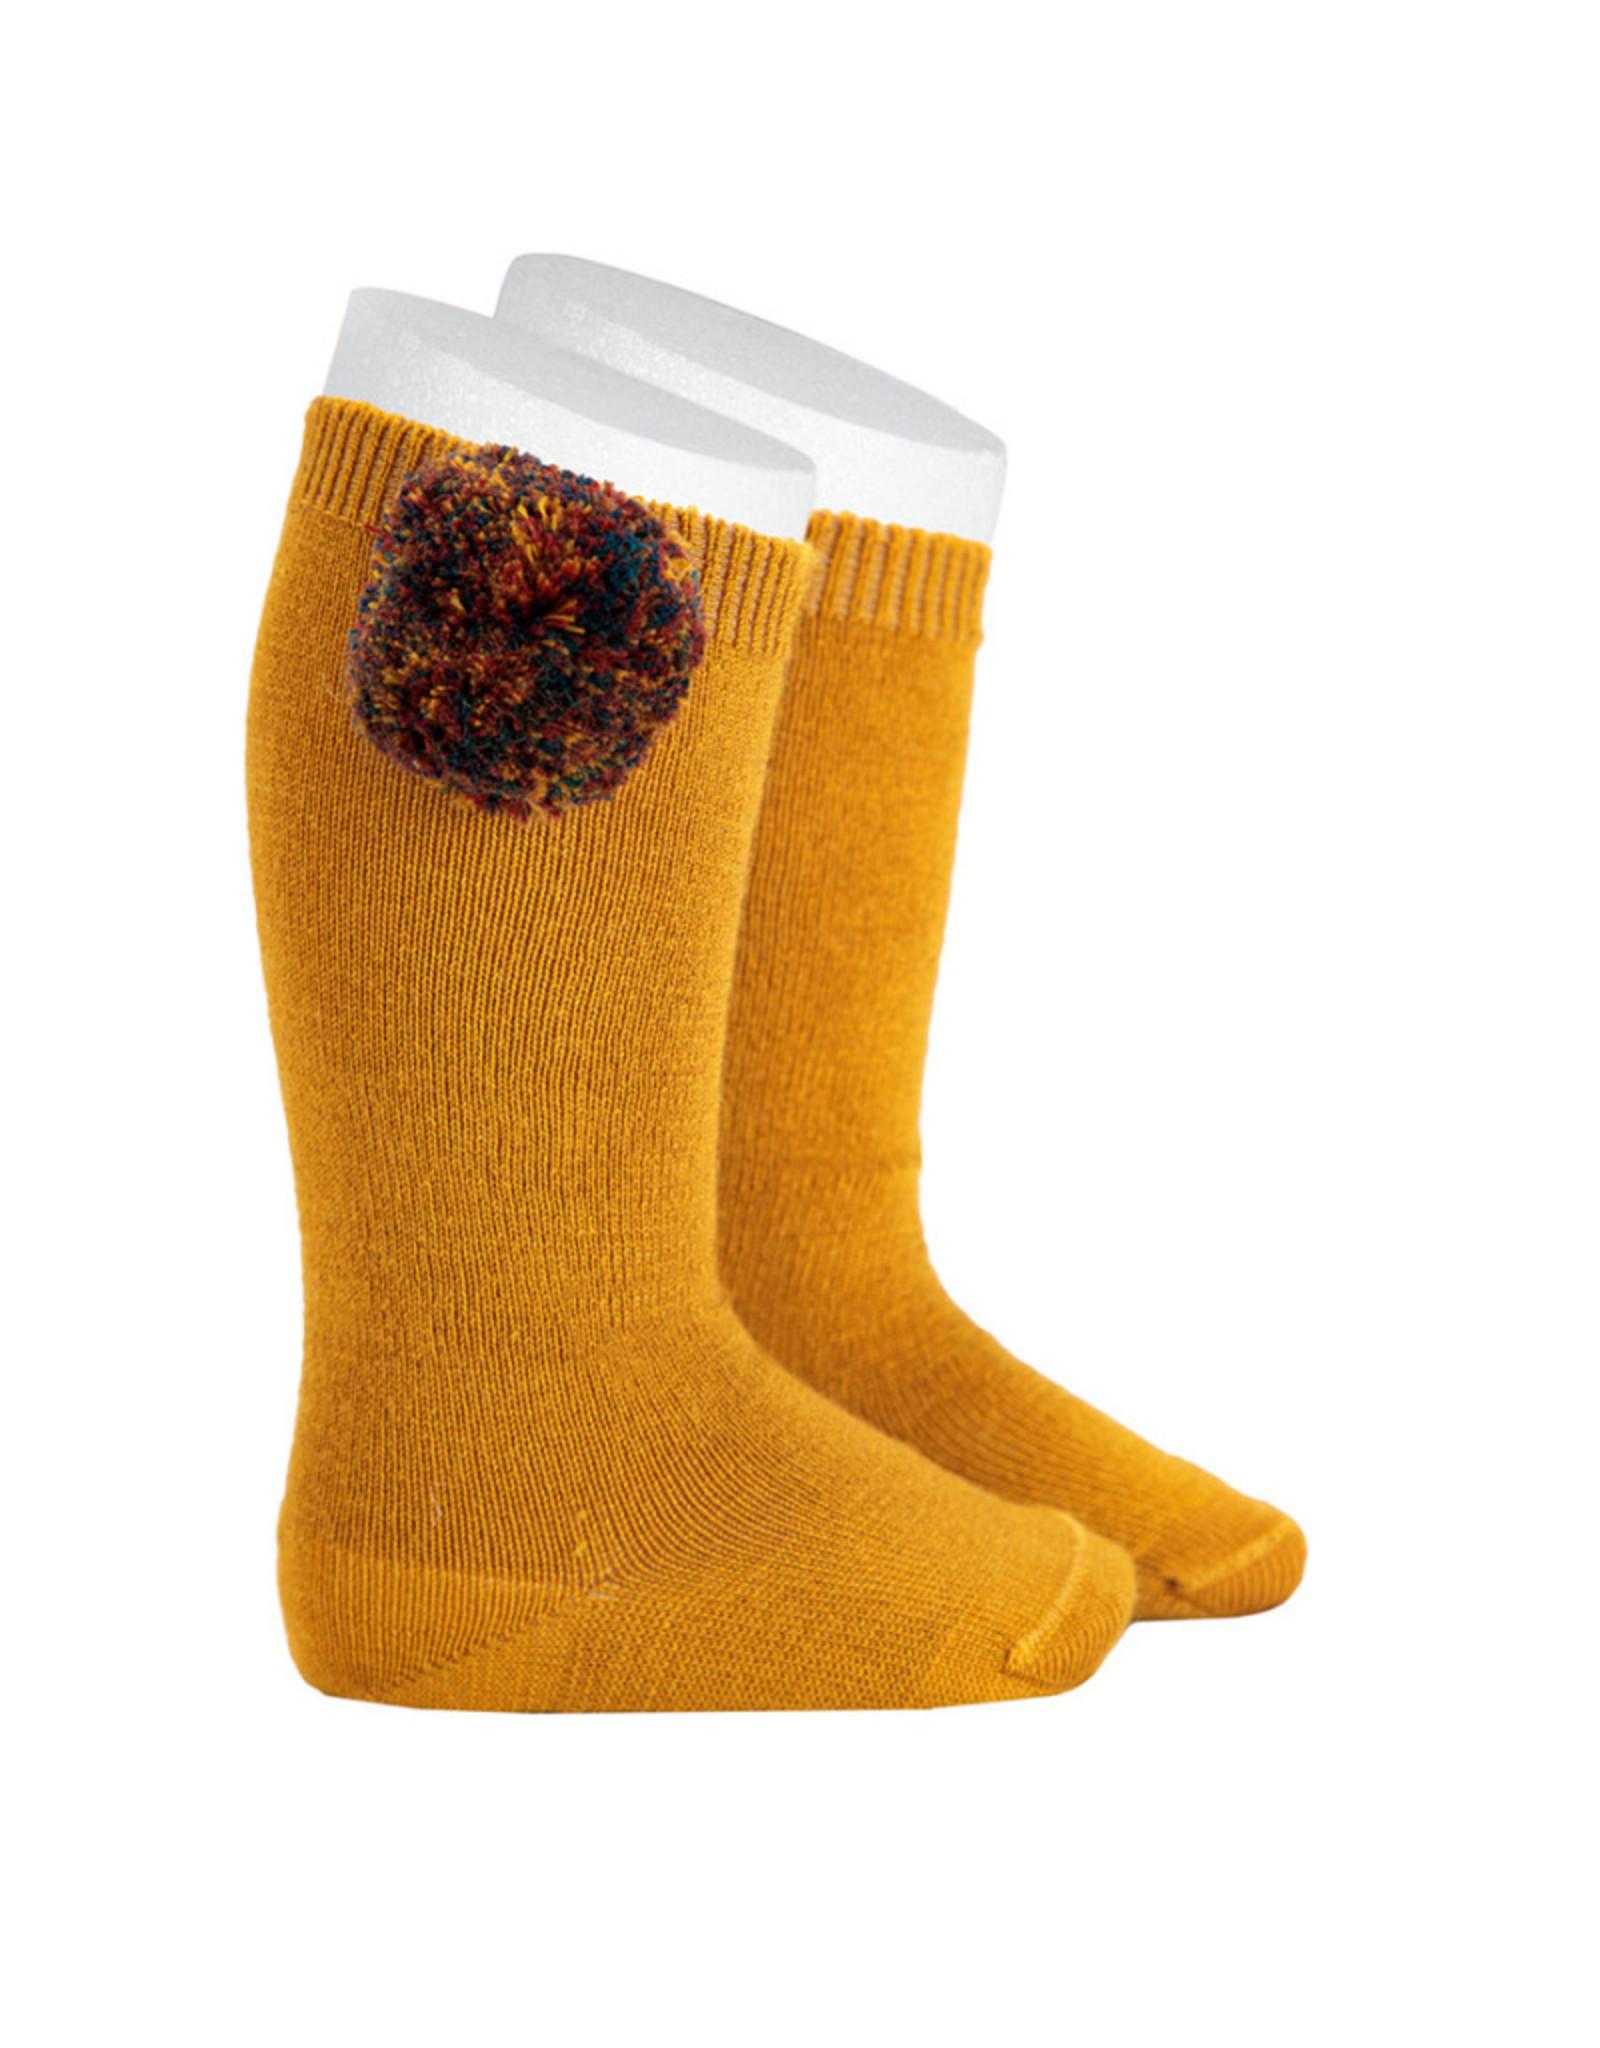 CONDOR Wool Pompom Knee Socks